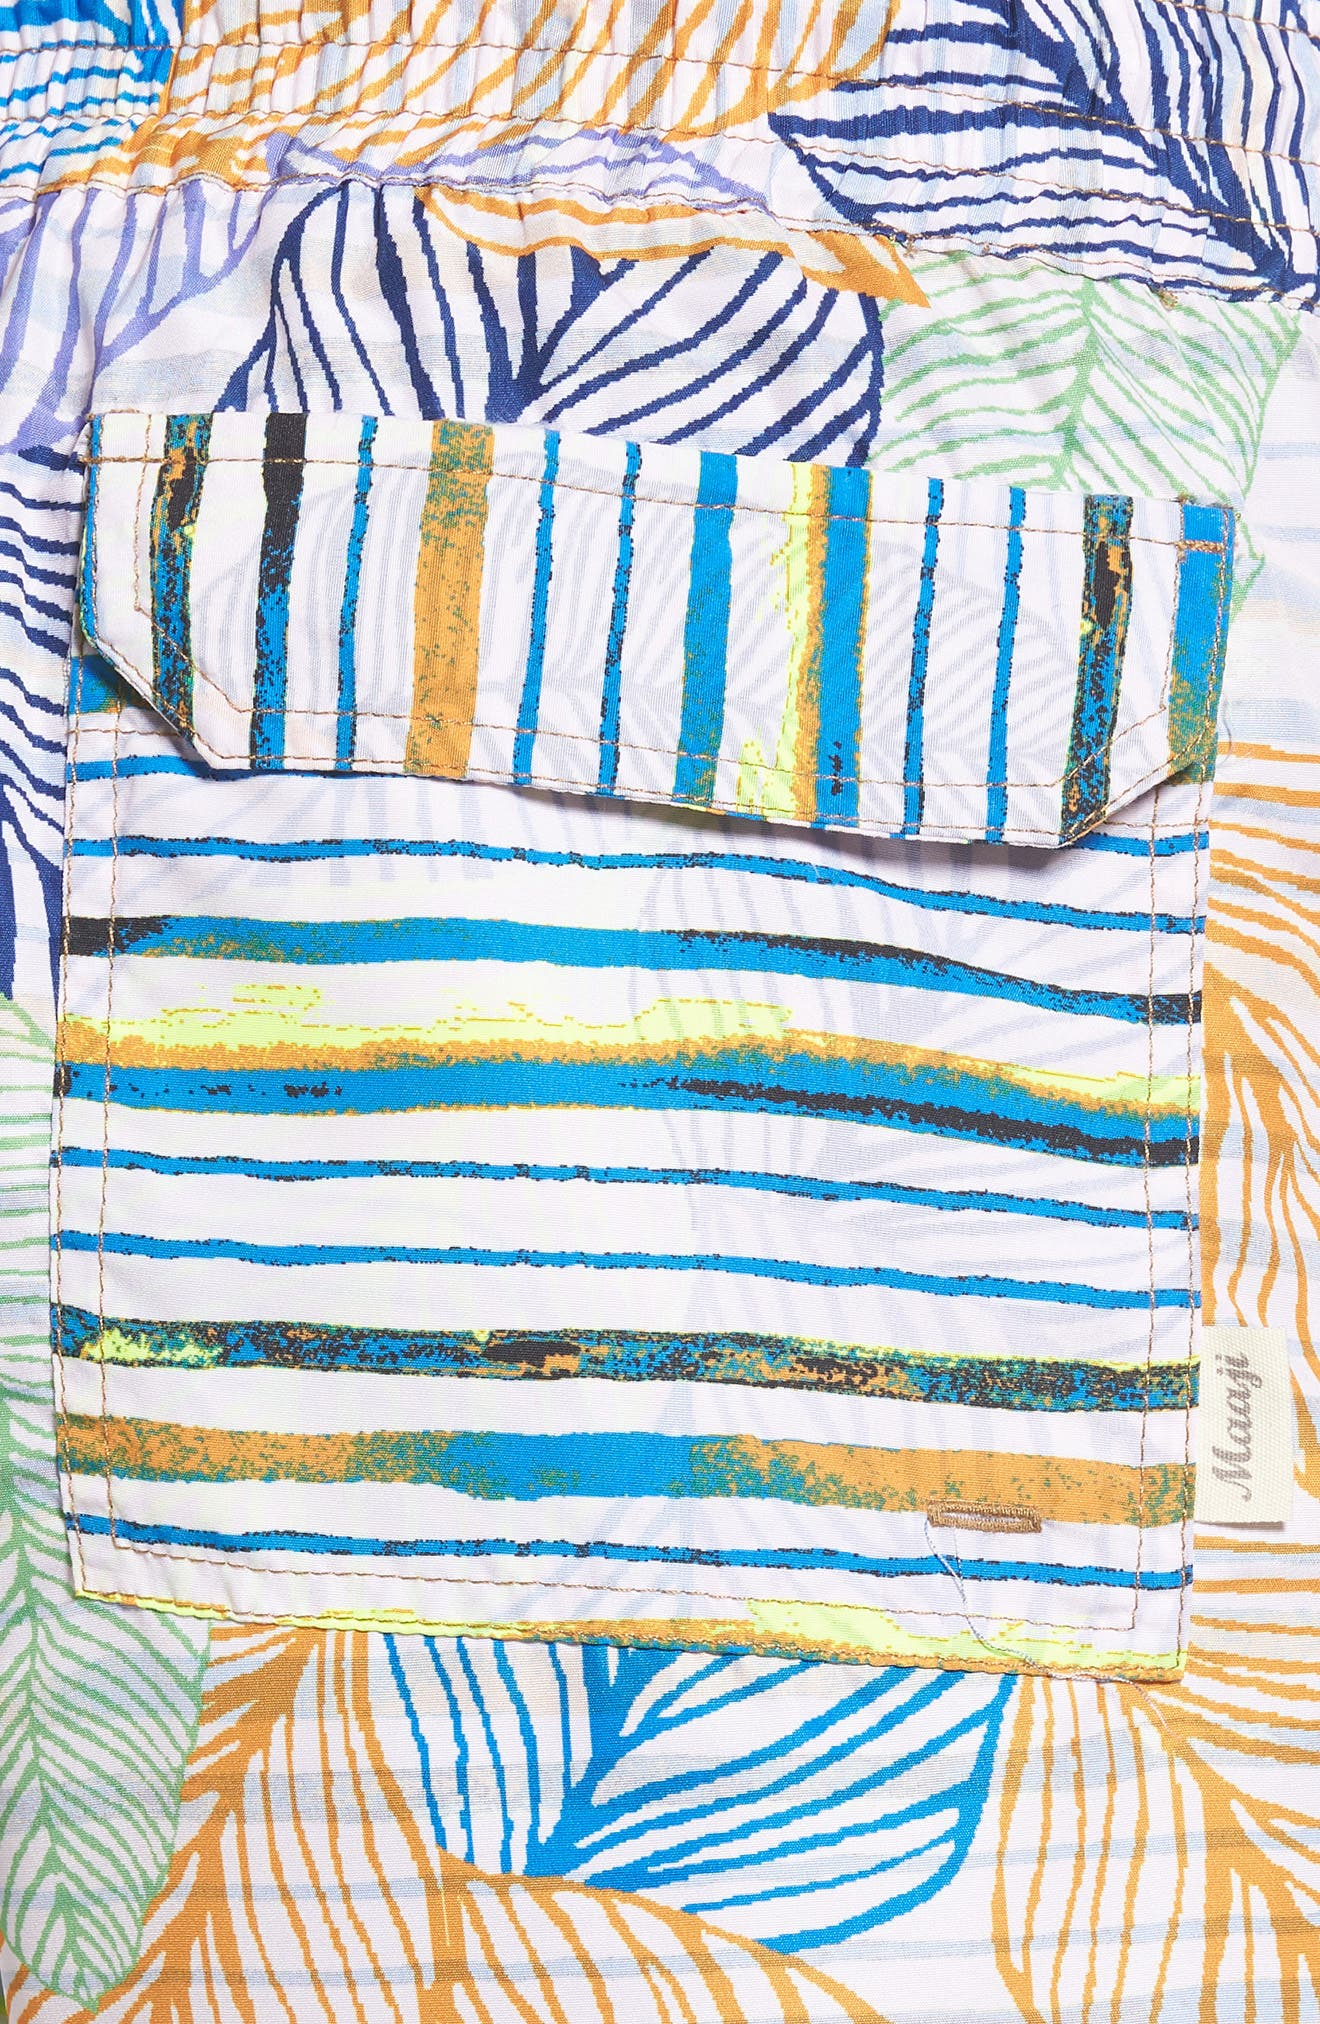 Blue Sky Reversible Swim Trunks,                             Alternate thumbnail 5, color,                             MULTICOLOR